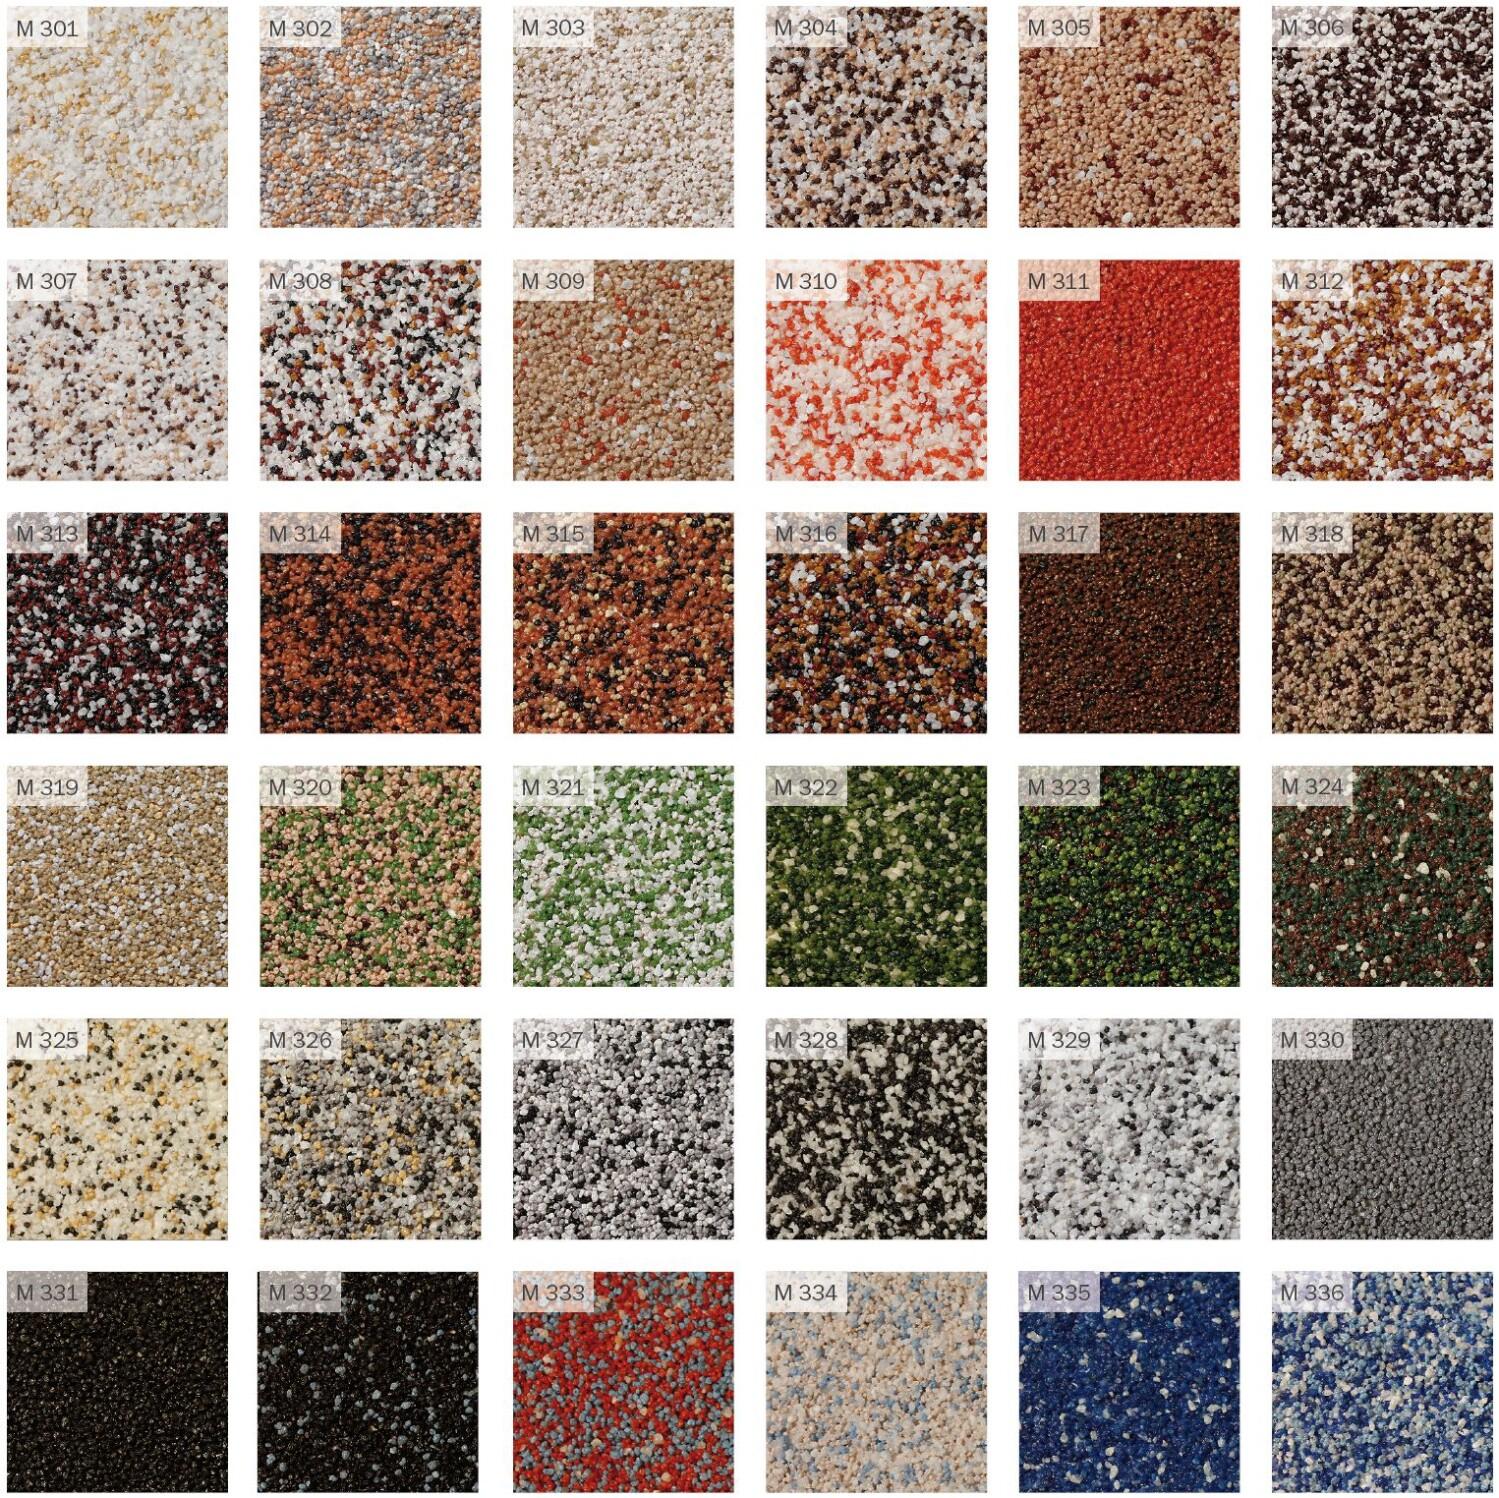 Fabulous Mosaikputz richtig verarbeiten - Mosaikputz verarbeiten YP08